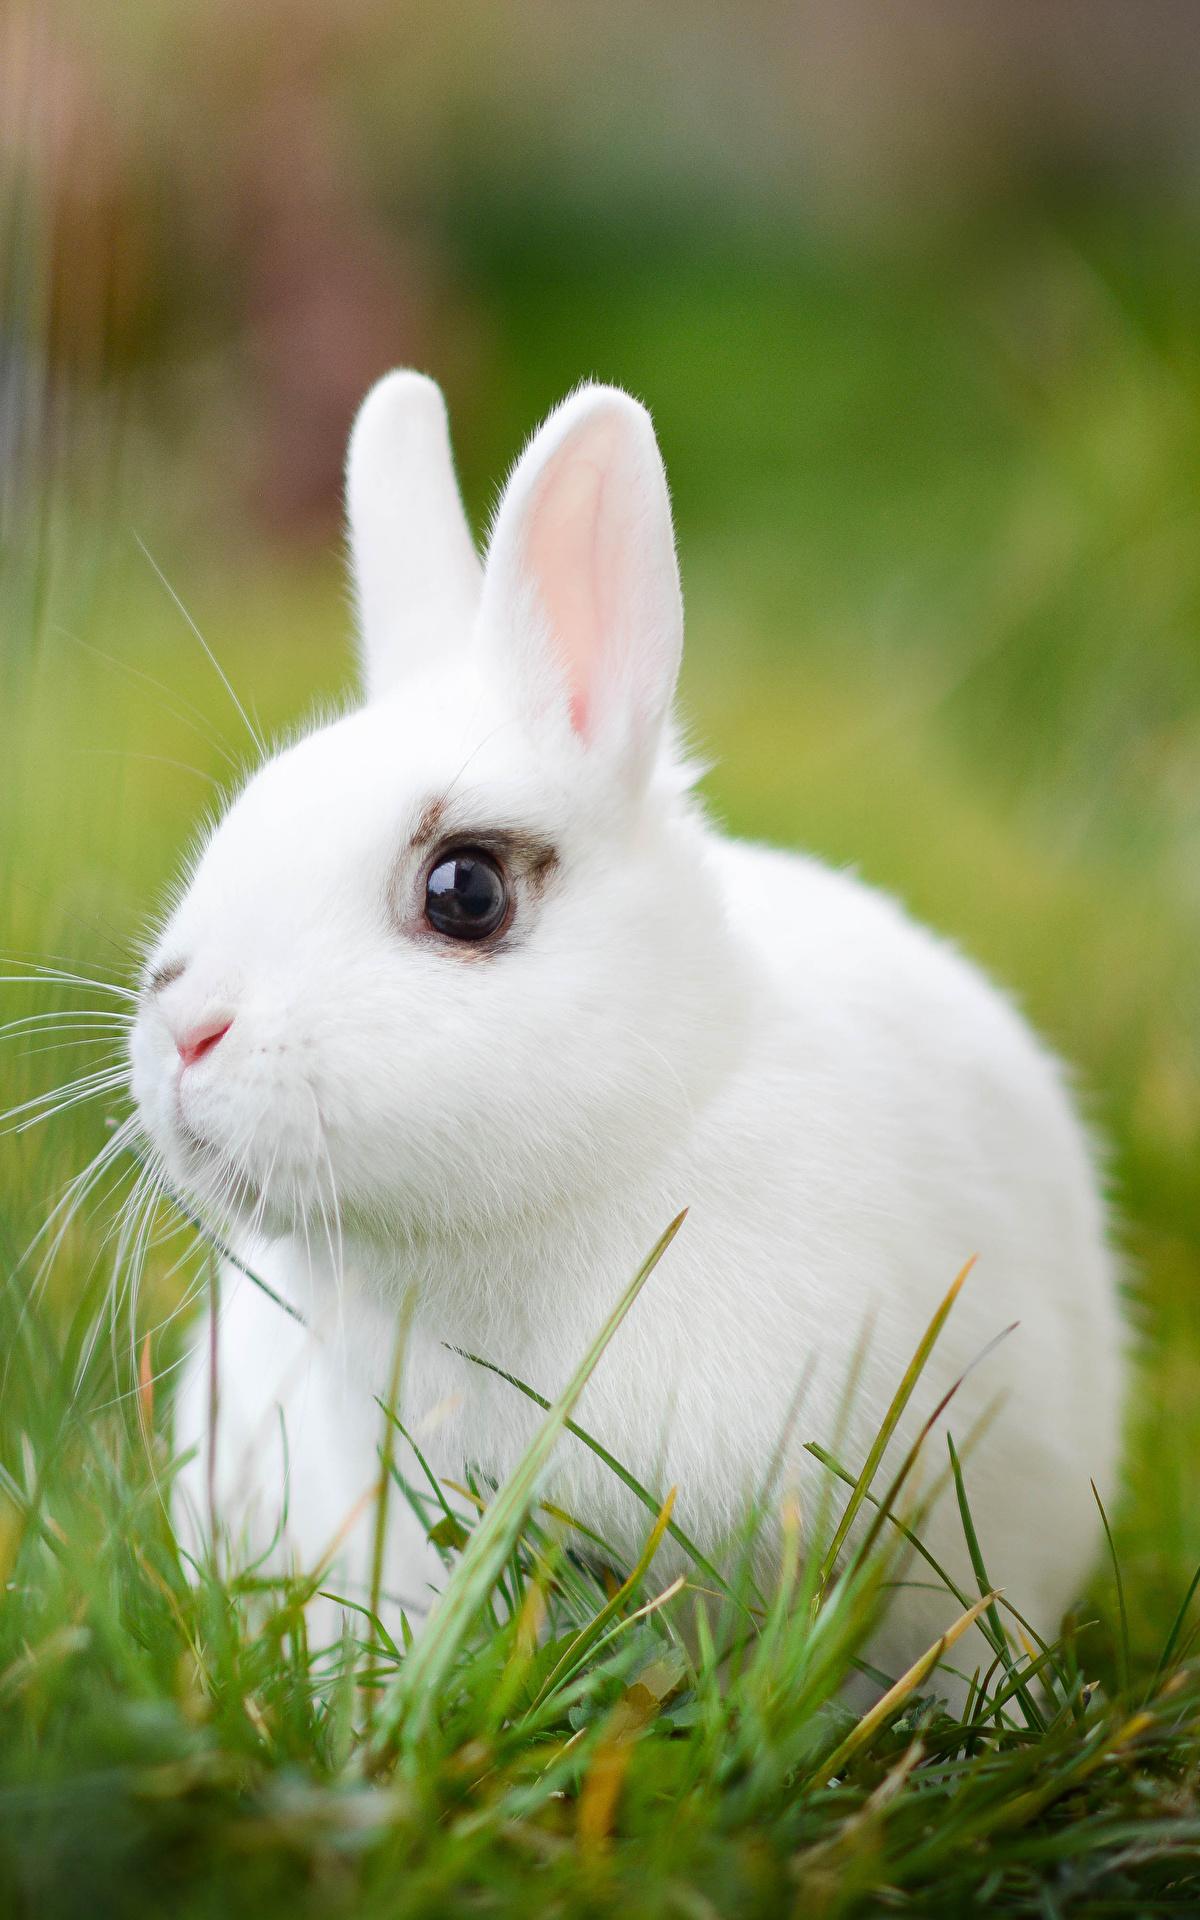 Rabbits_Grass_511940_1200x1920.jpg